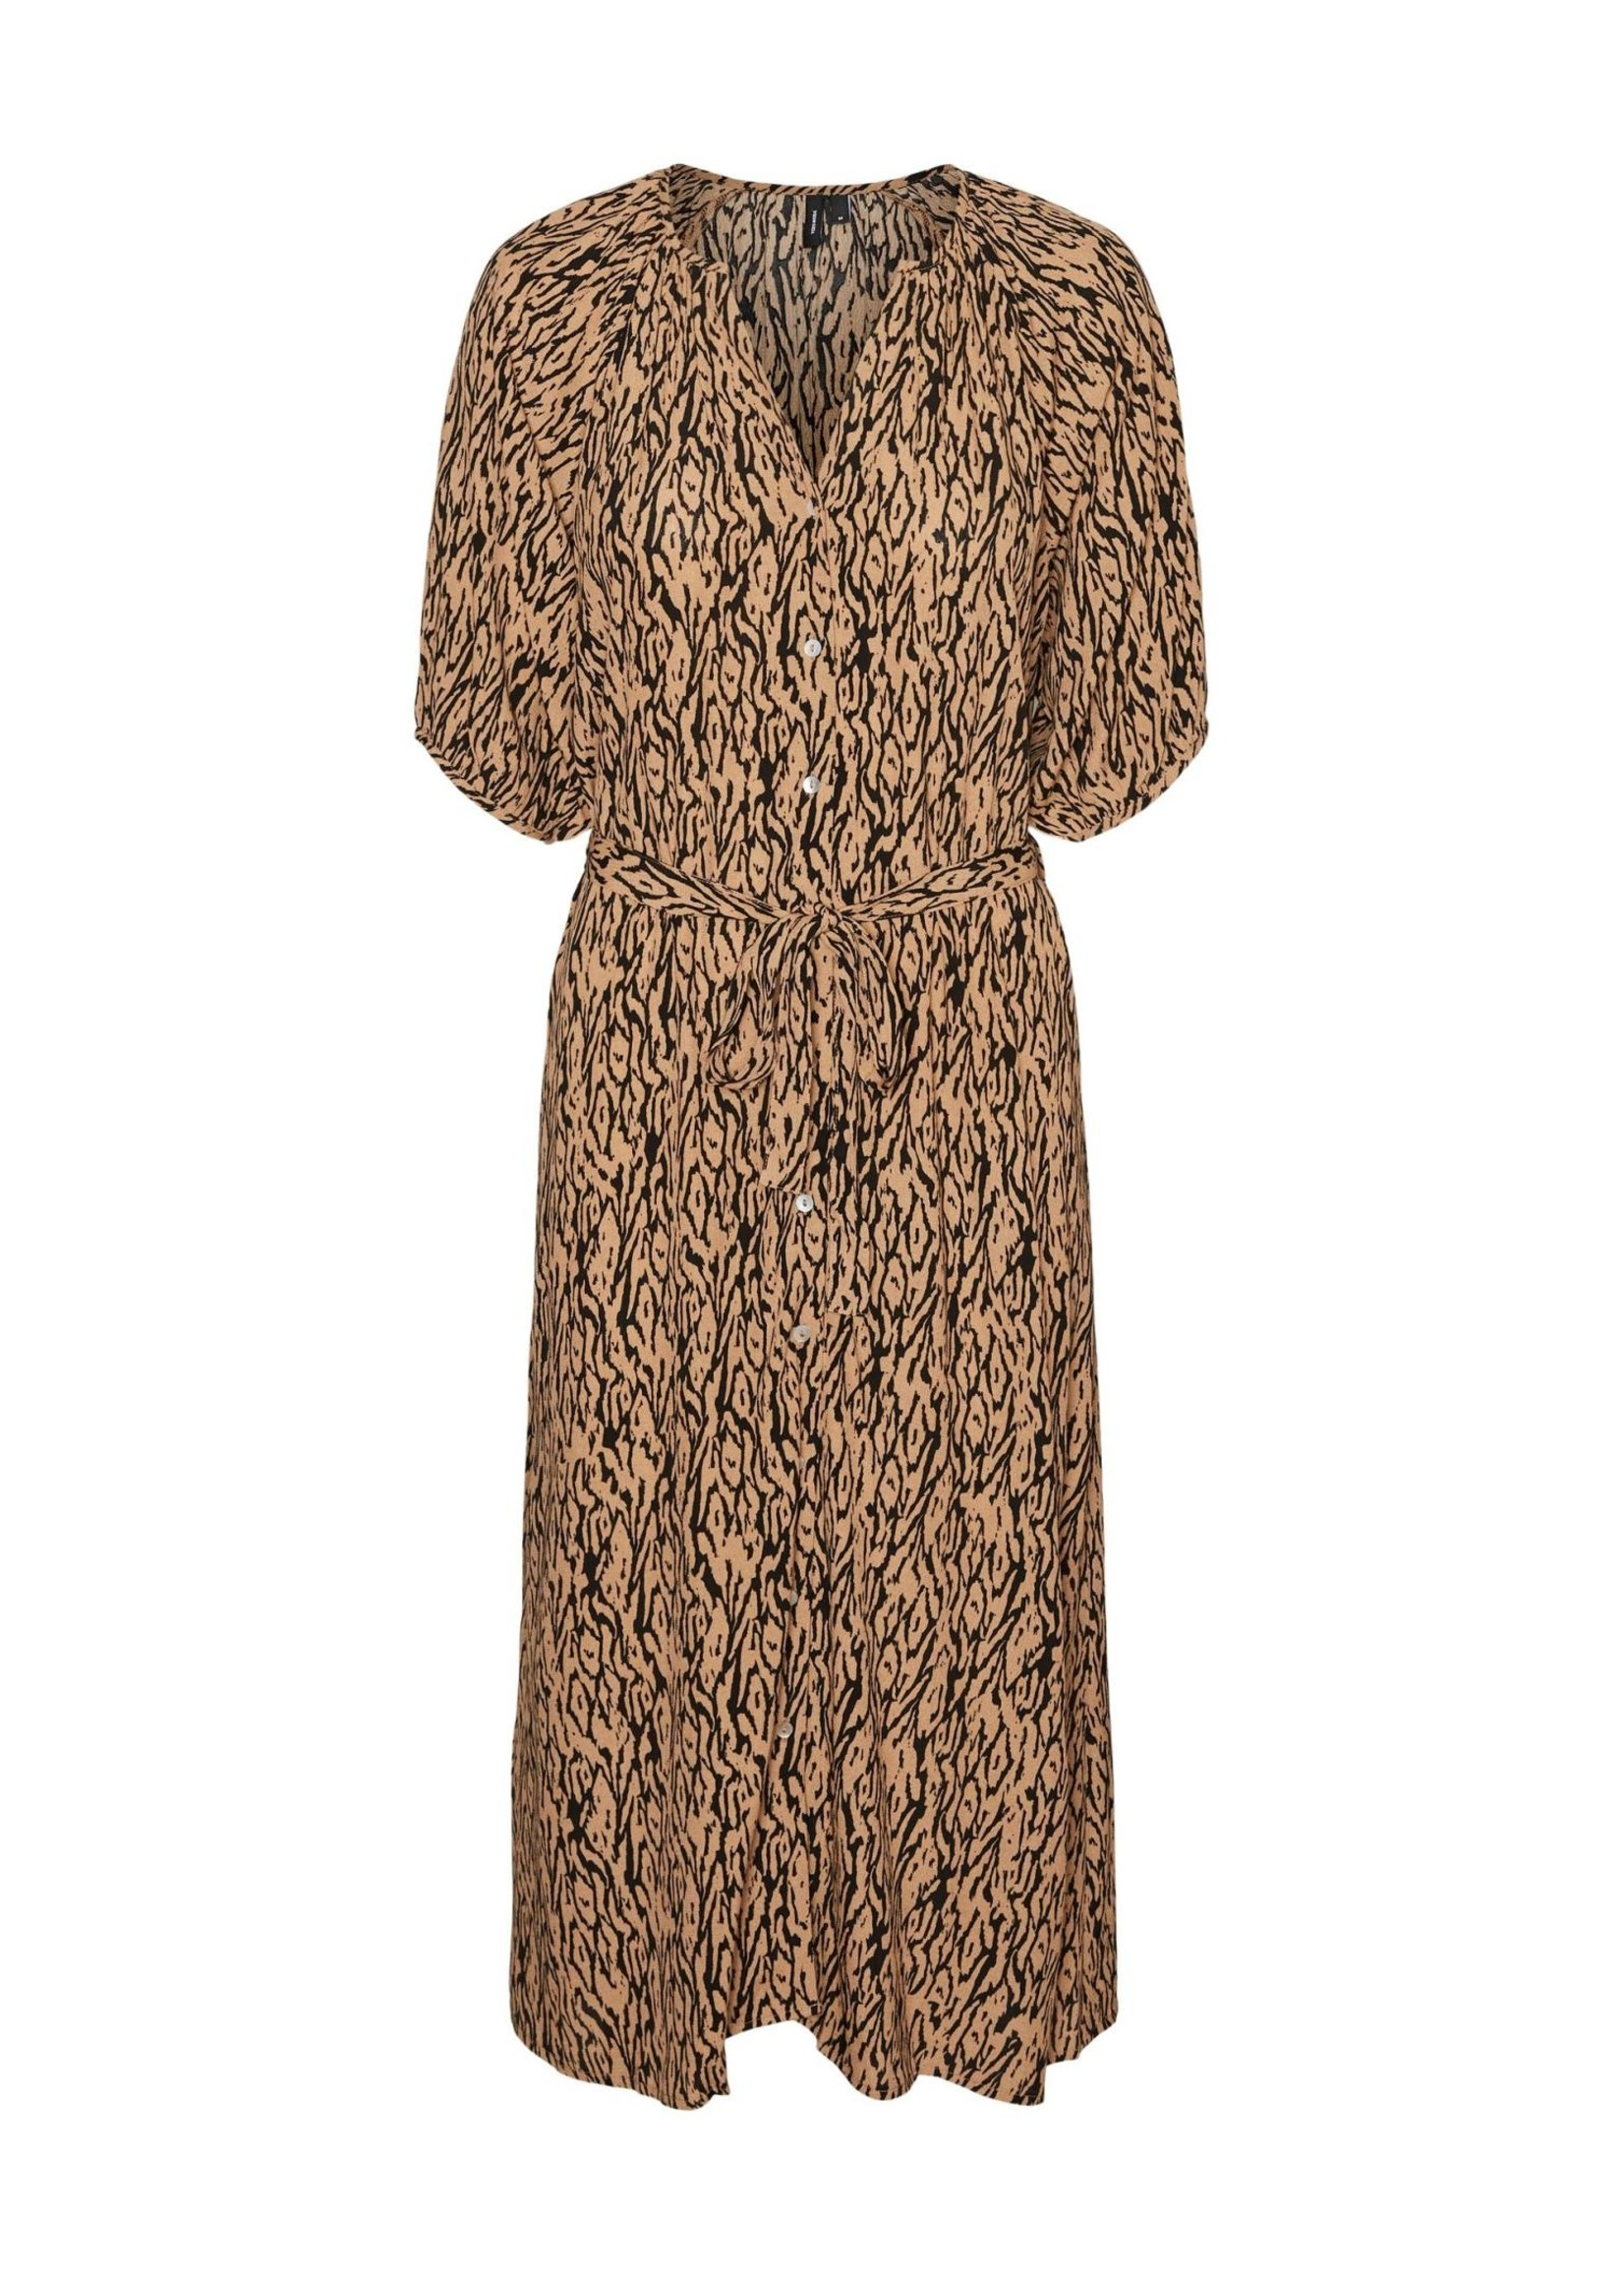 VERO MODA PILOU 2/4 CALF SHIRT DRESS WVN GA tan pilou